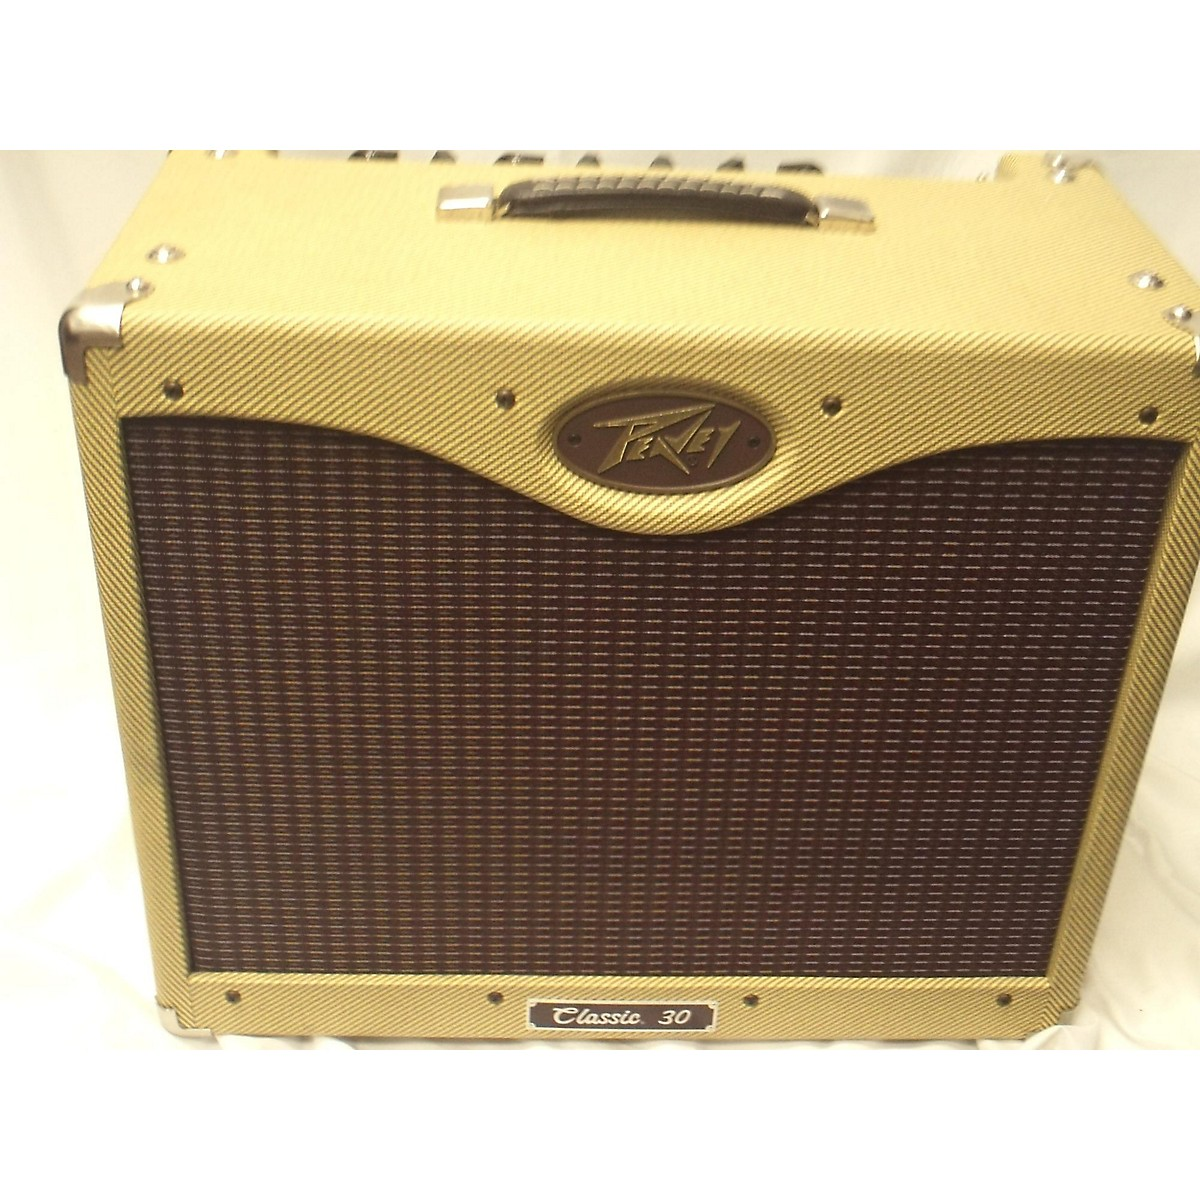 Used Peavey Classic 30 112 30W 1x12 Tube Tube Guitar Combo